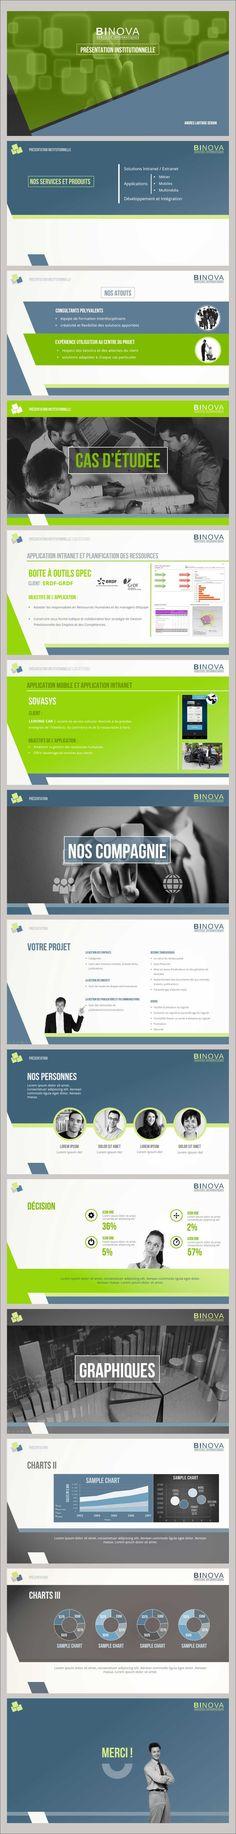 BINOVA | Service Informatique | PPT presentation Design